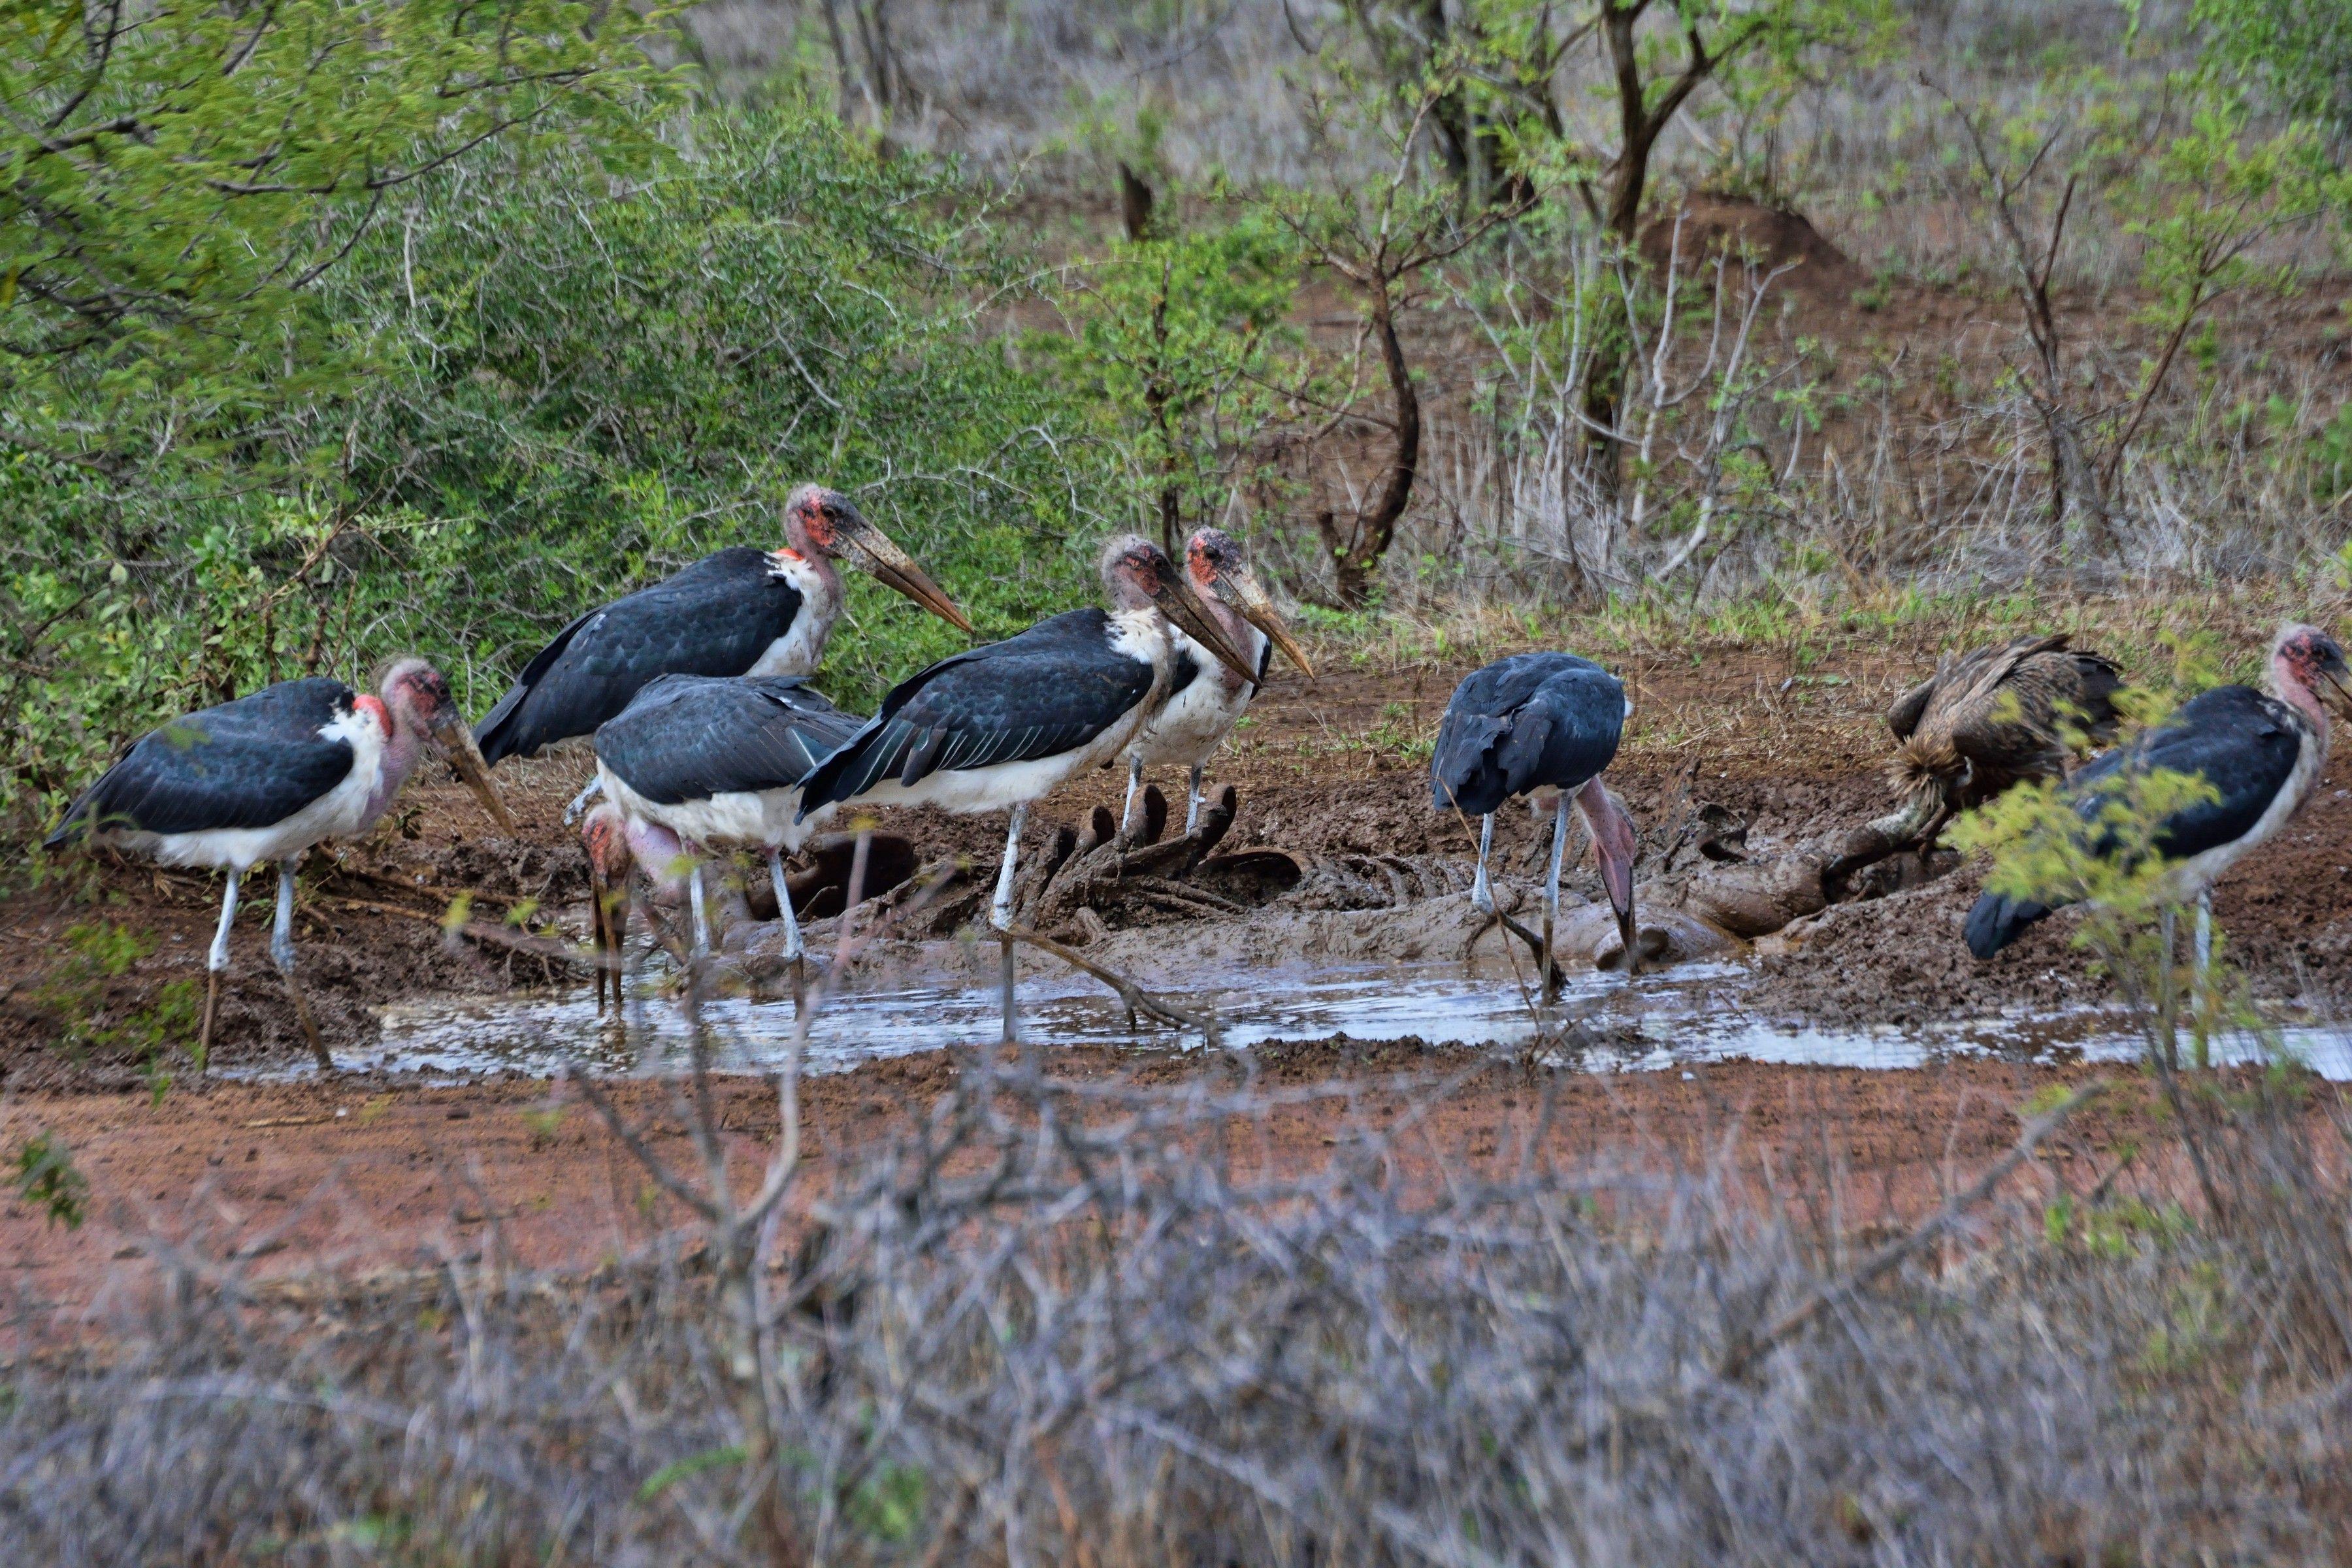 South Africa - Kruger Park (165) Marabou Storks and a White Backed Vulture